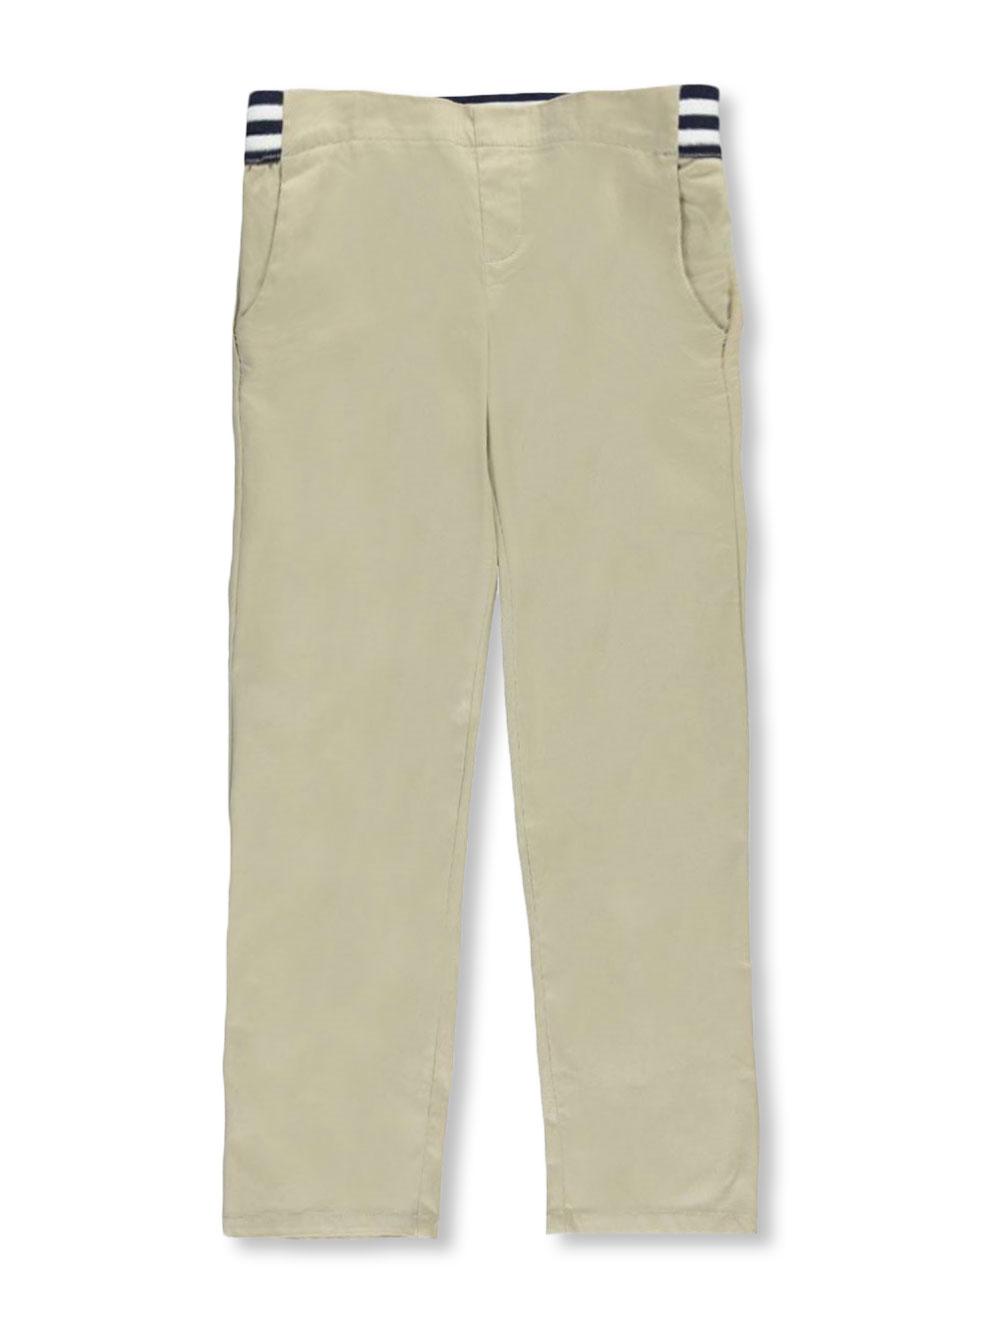 Boys School Uniform Pants 4 French Toast Khaki Cotton Blend  Pants